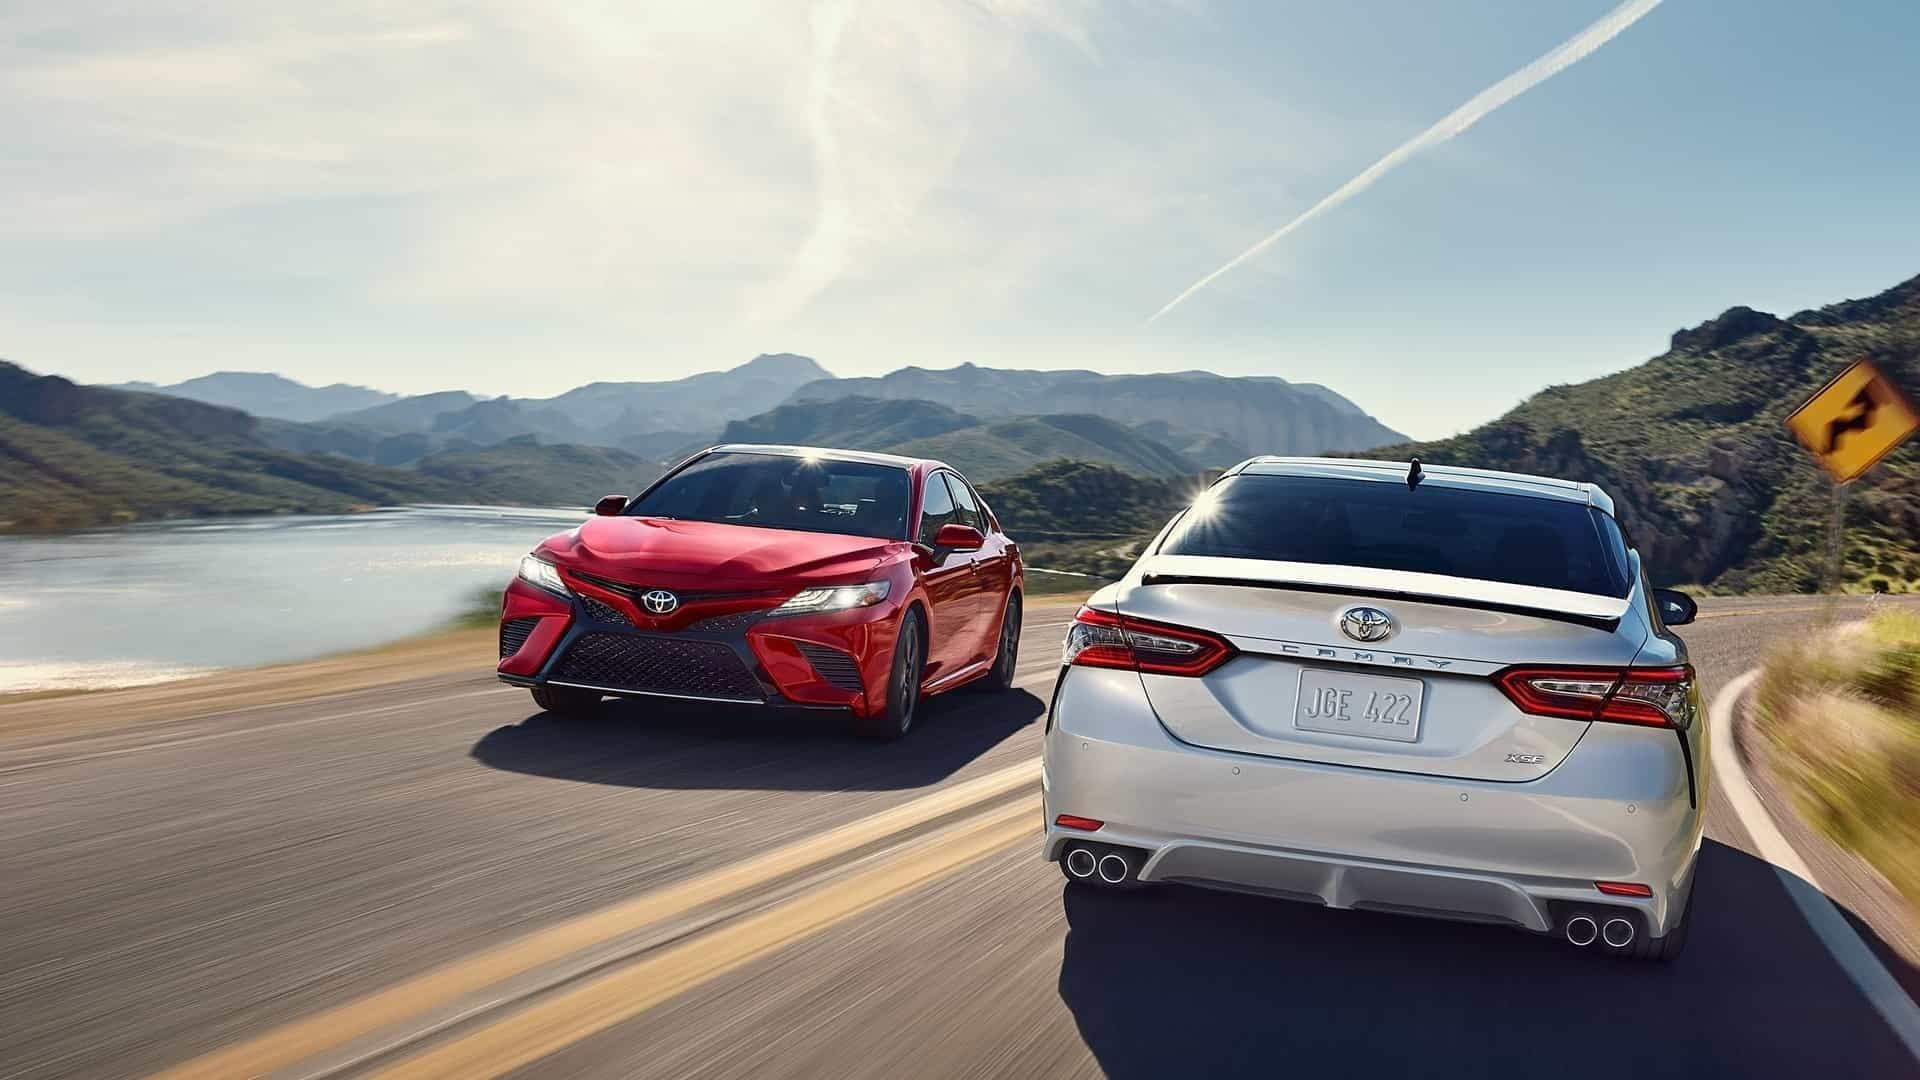 Lease a 2020 Toyota Camry near Cranston RI